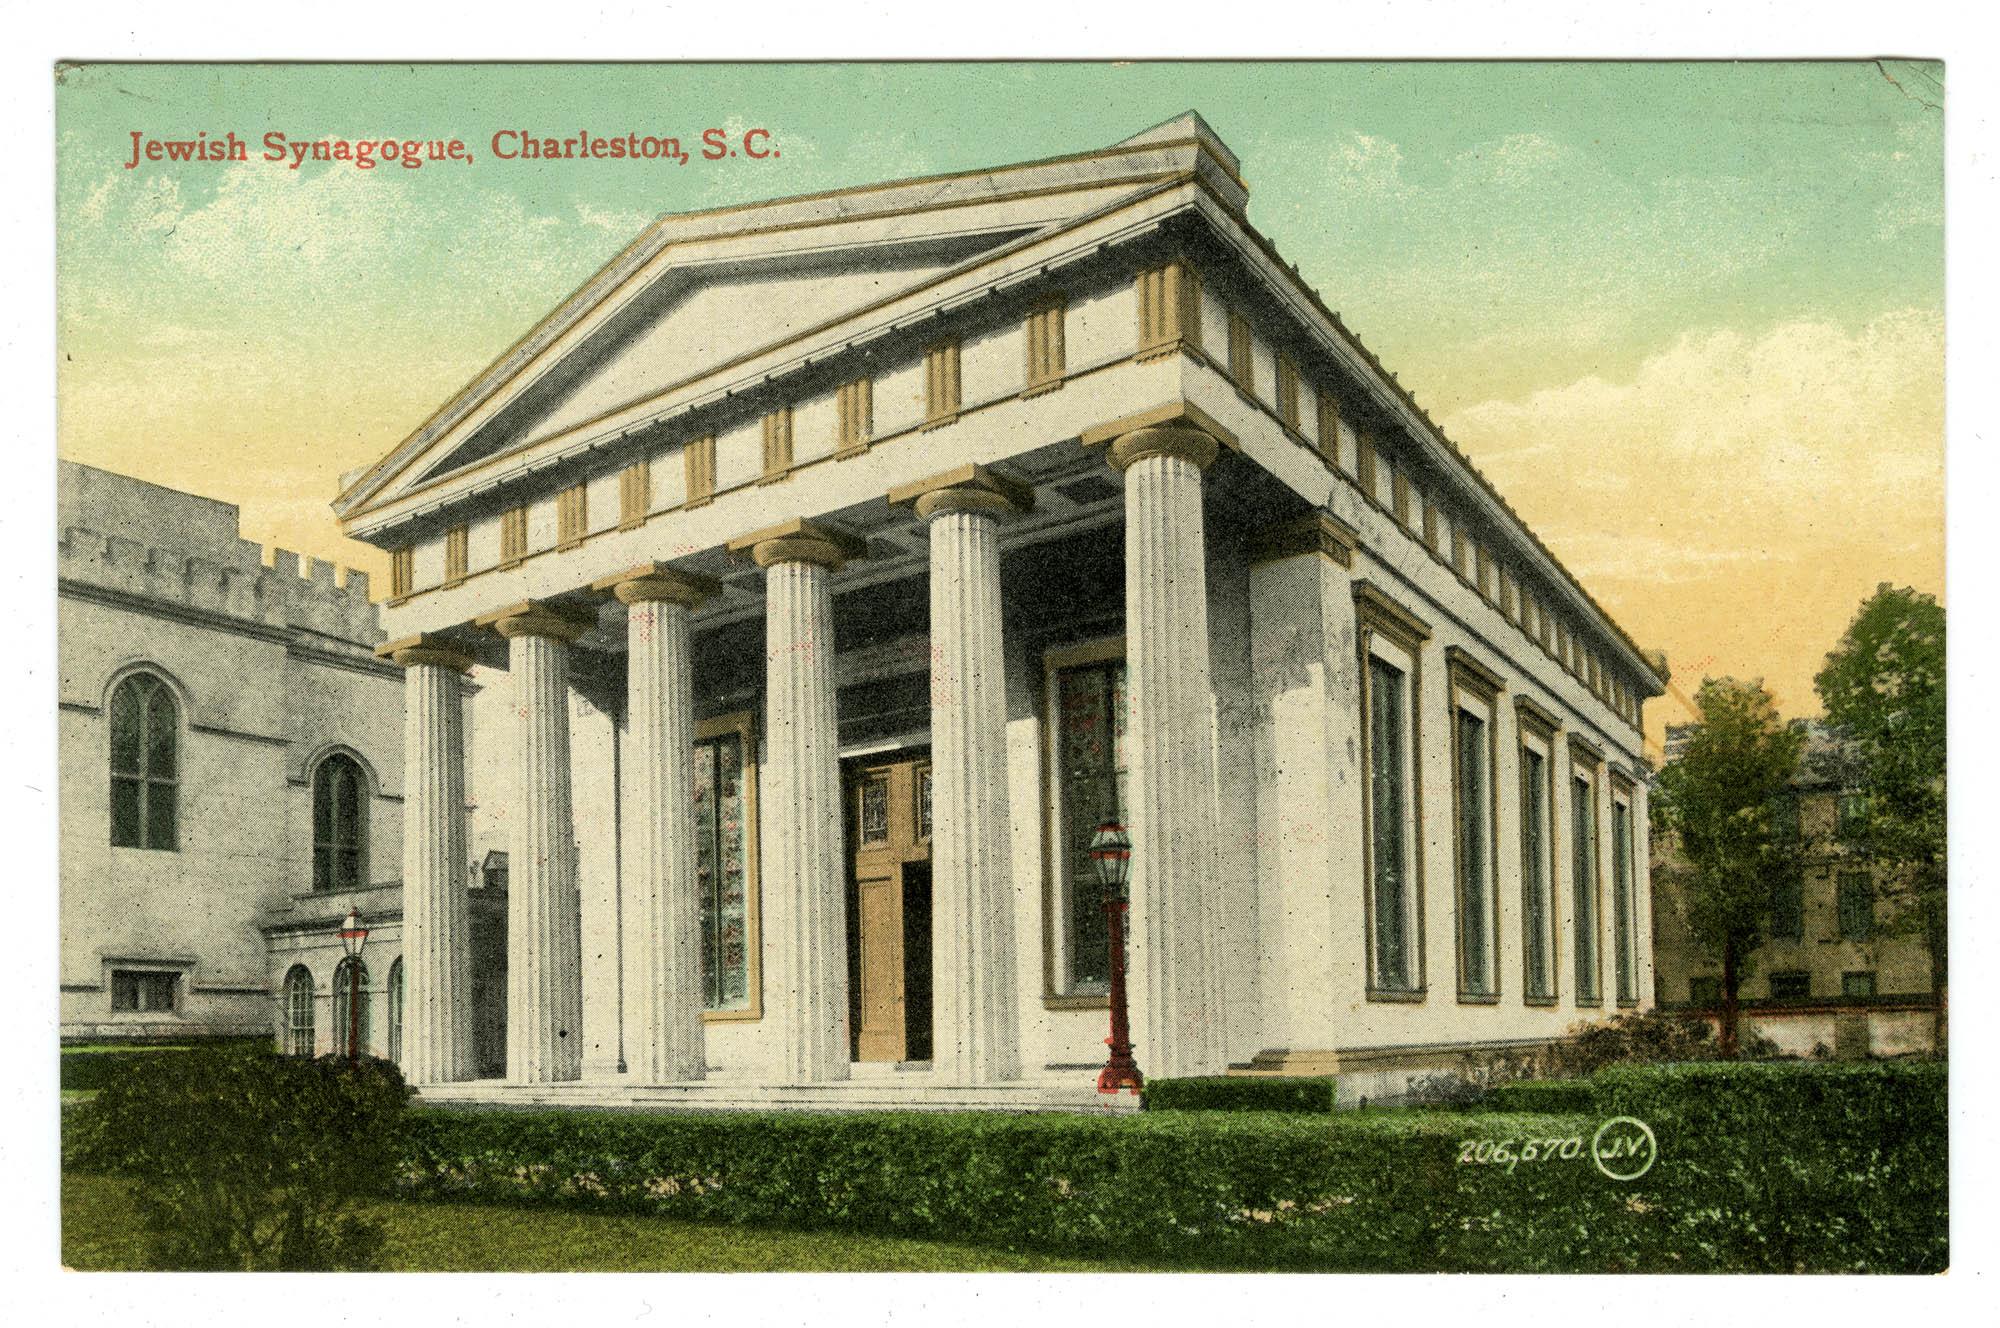 Jewish Synagogue, Charleston, S.C.